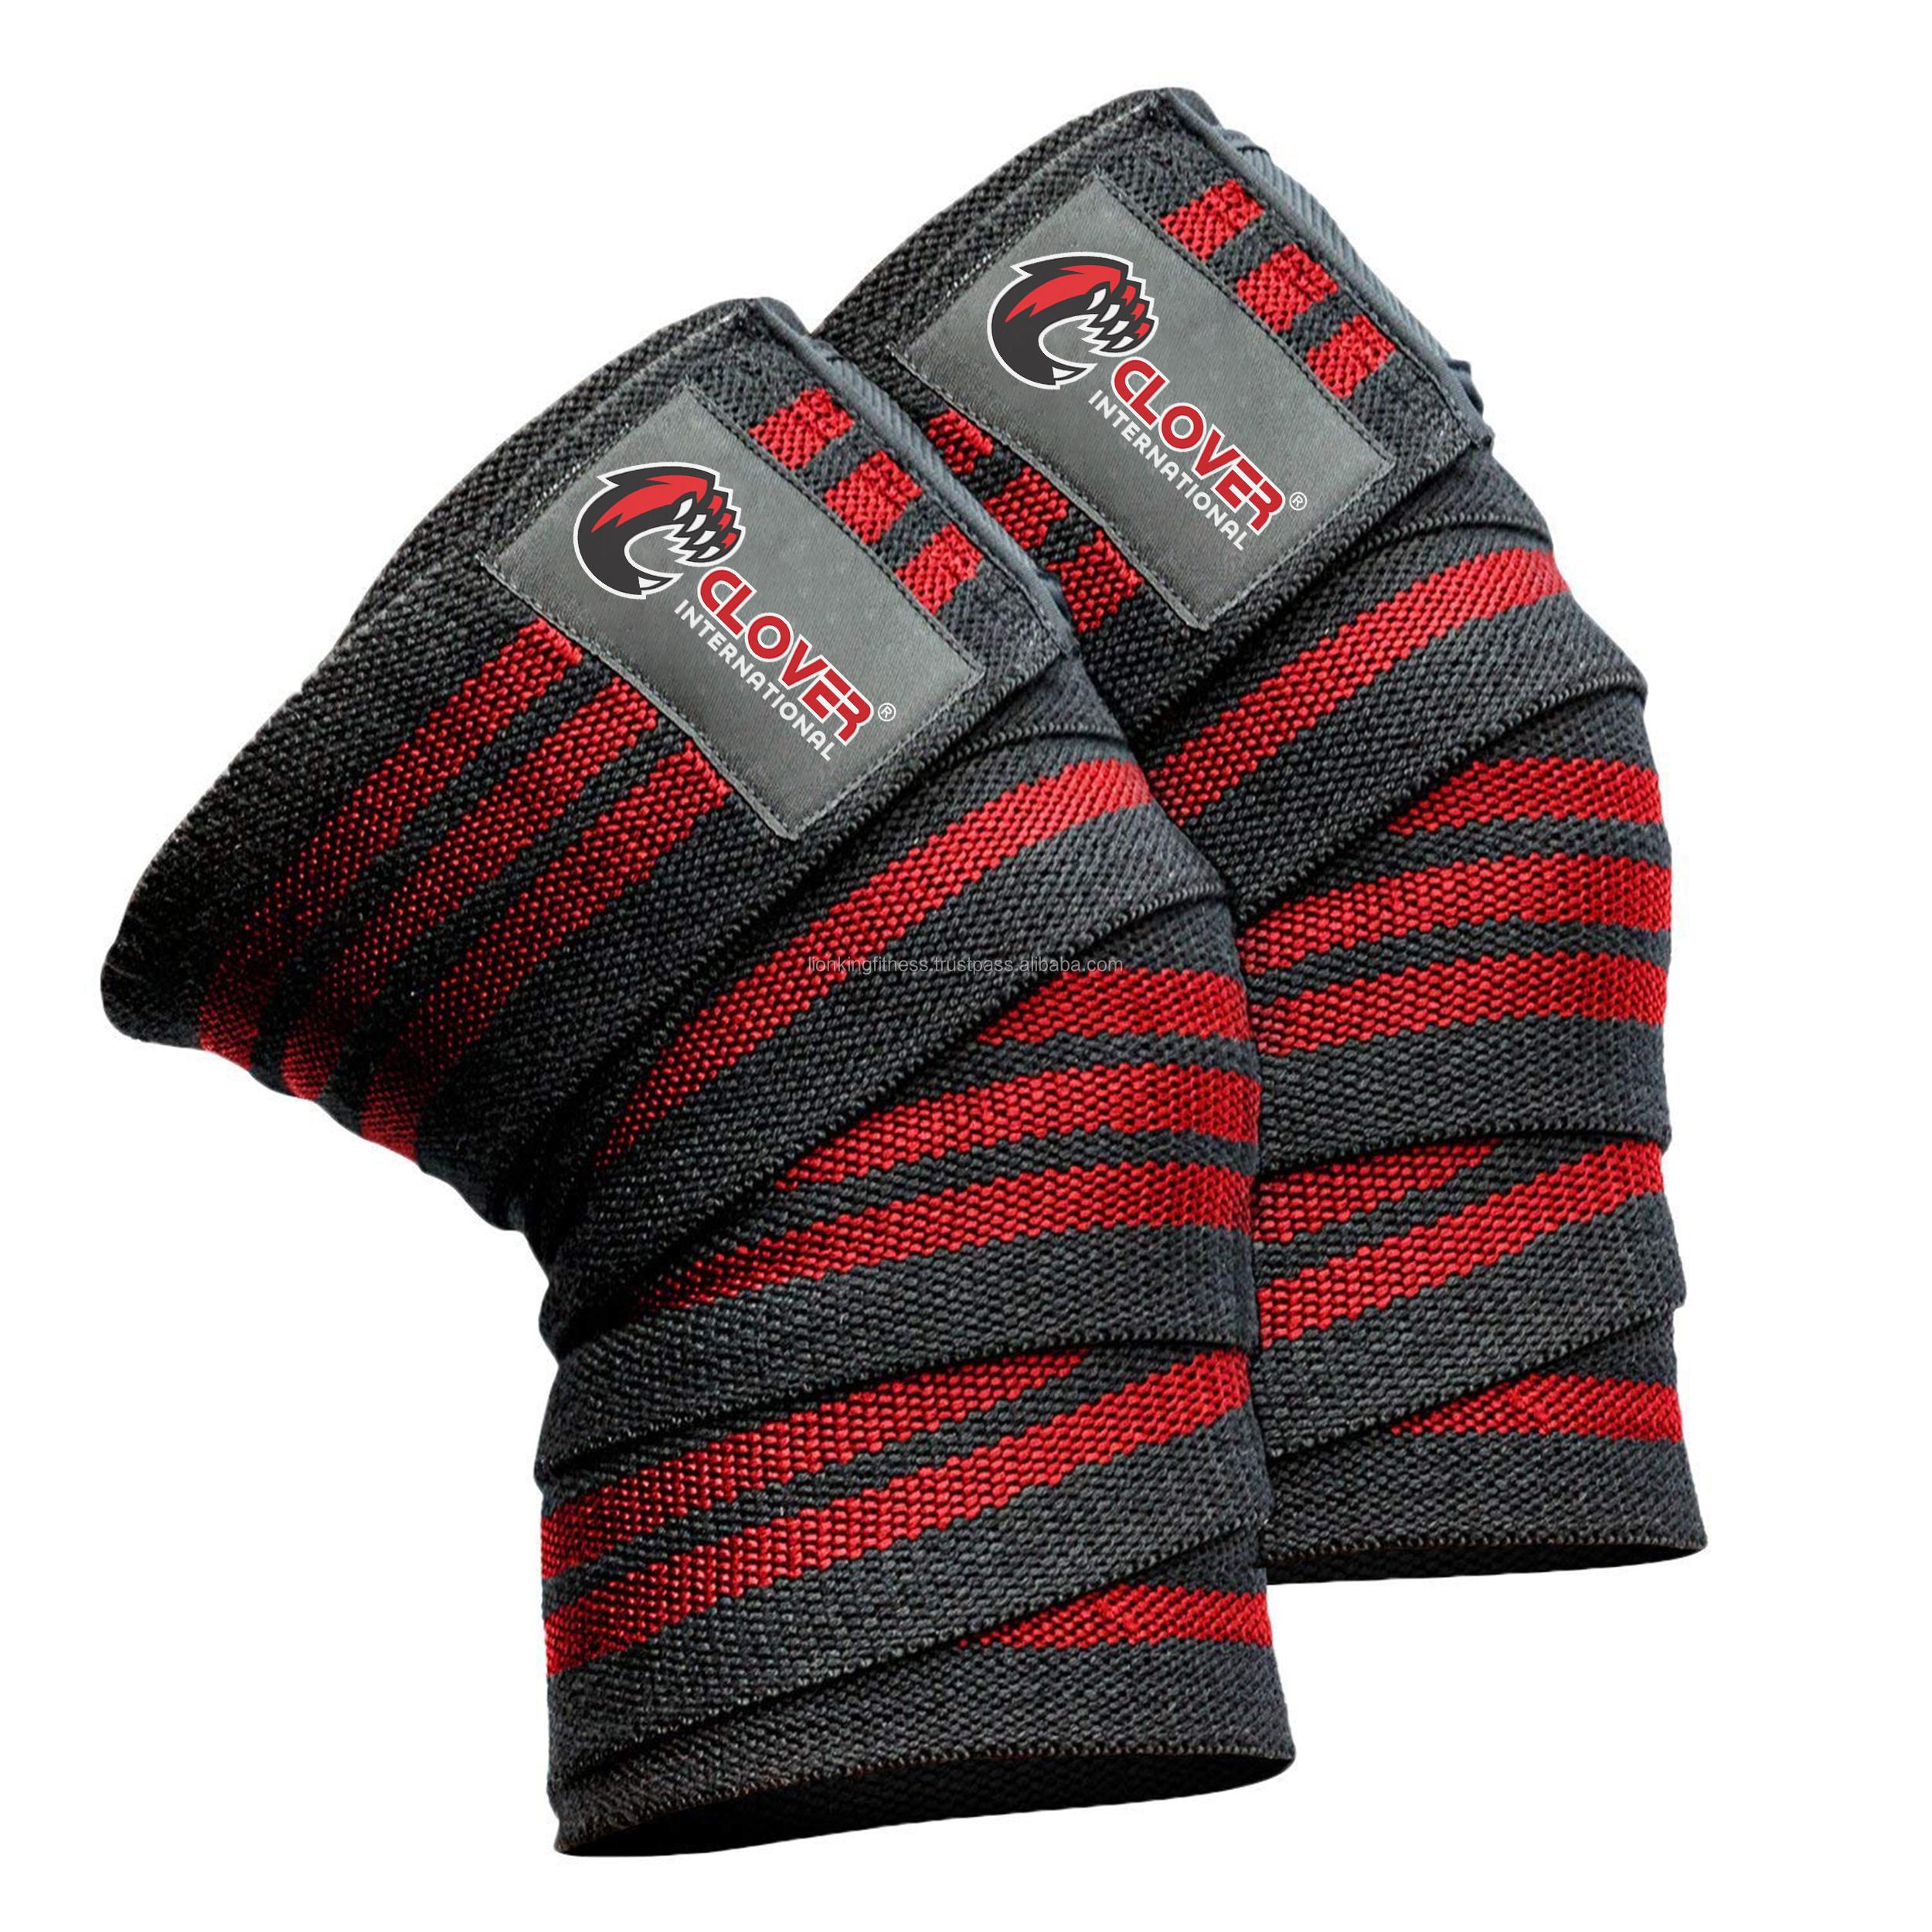 Men knee compression support wraps